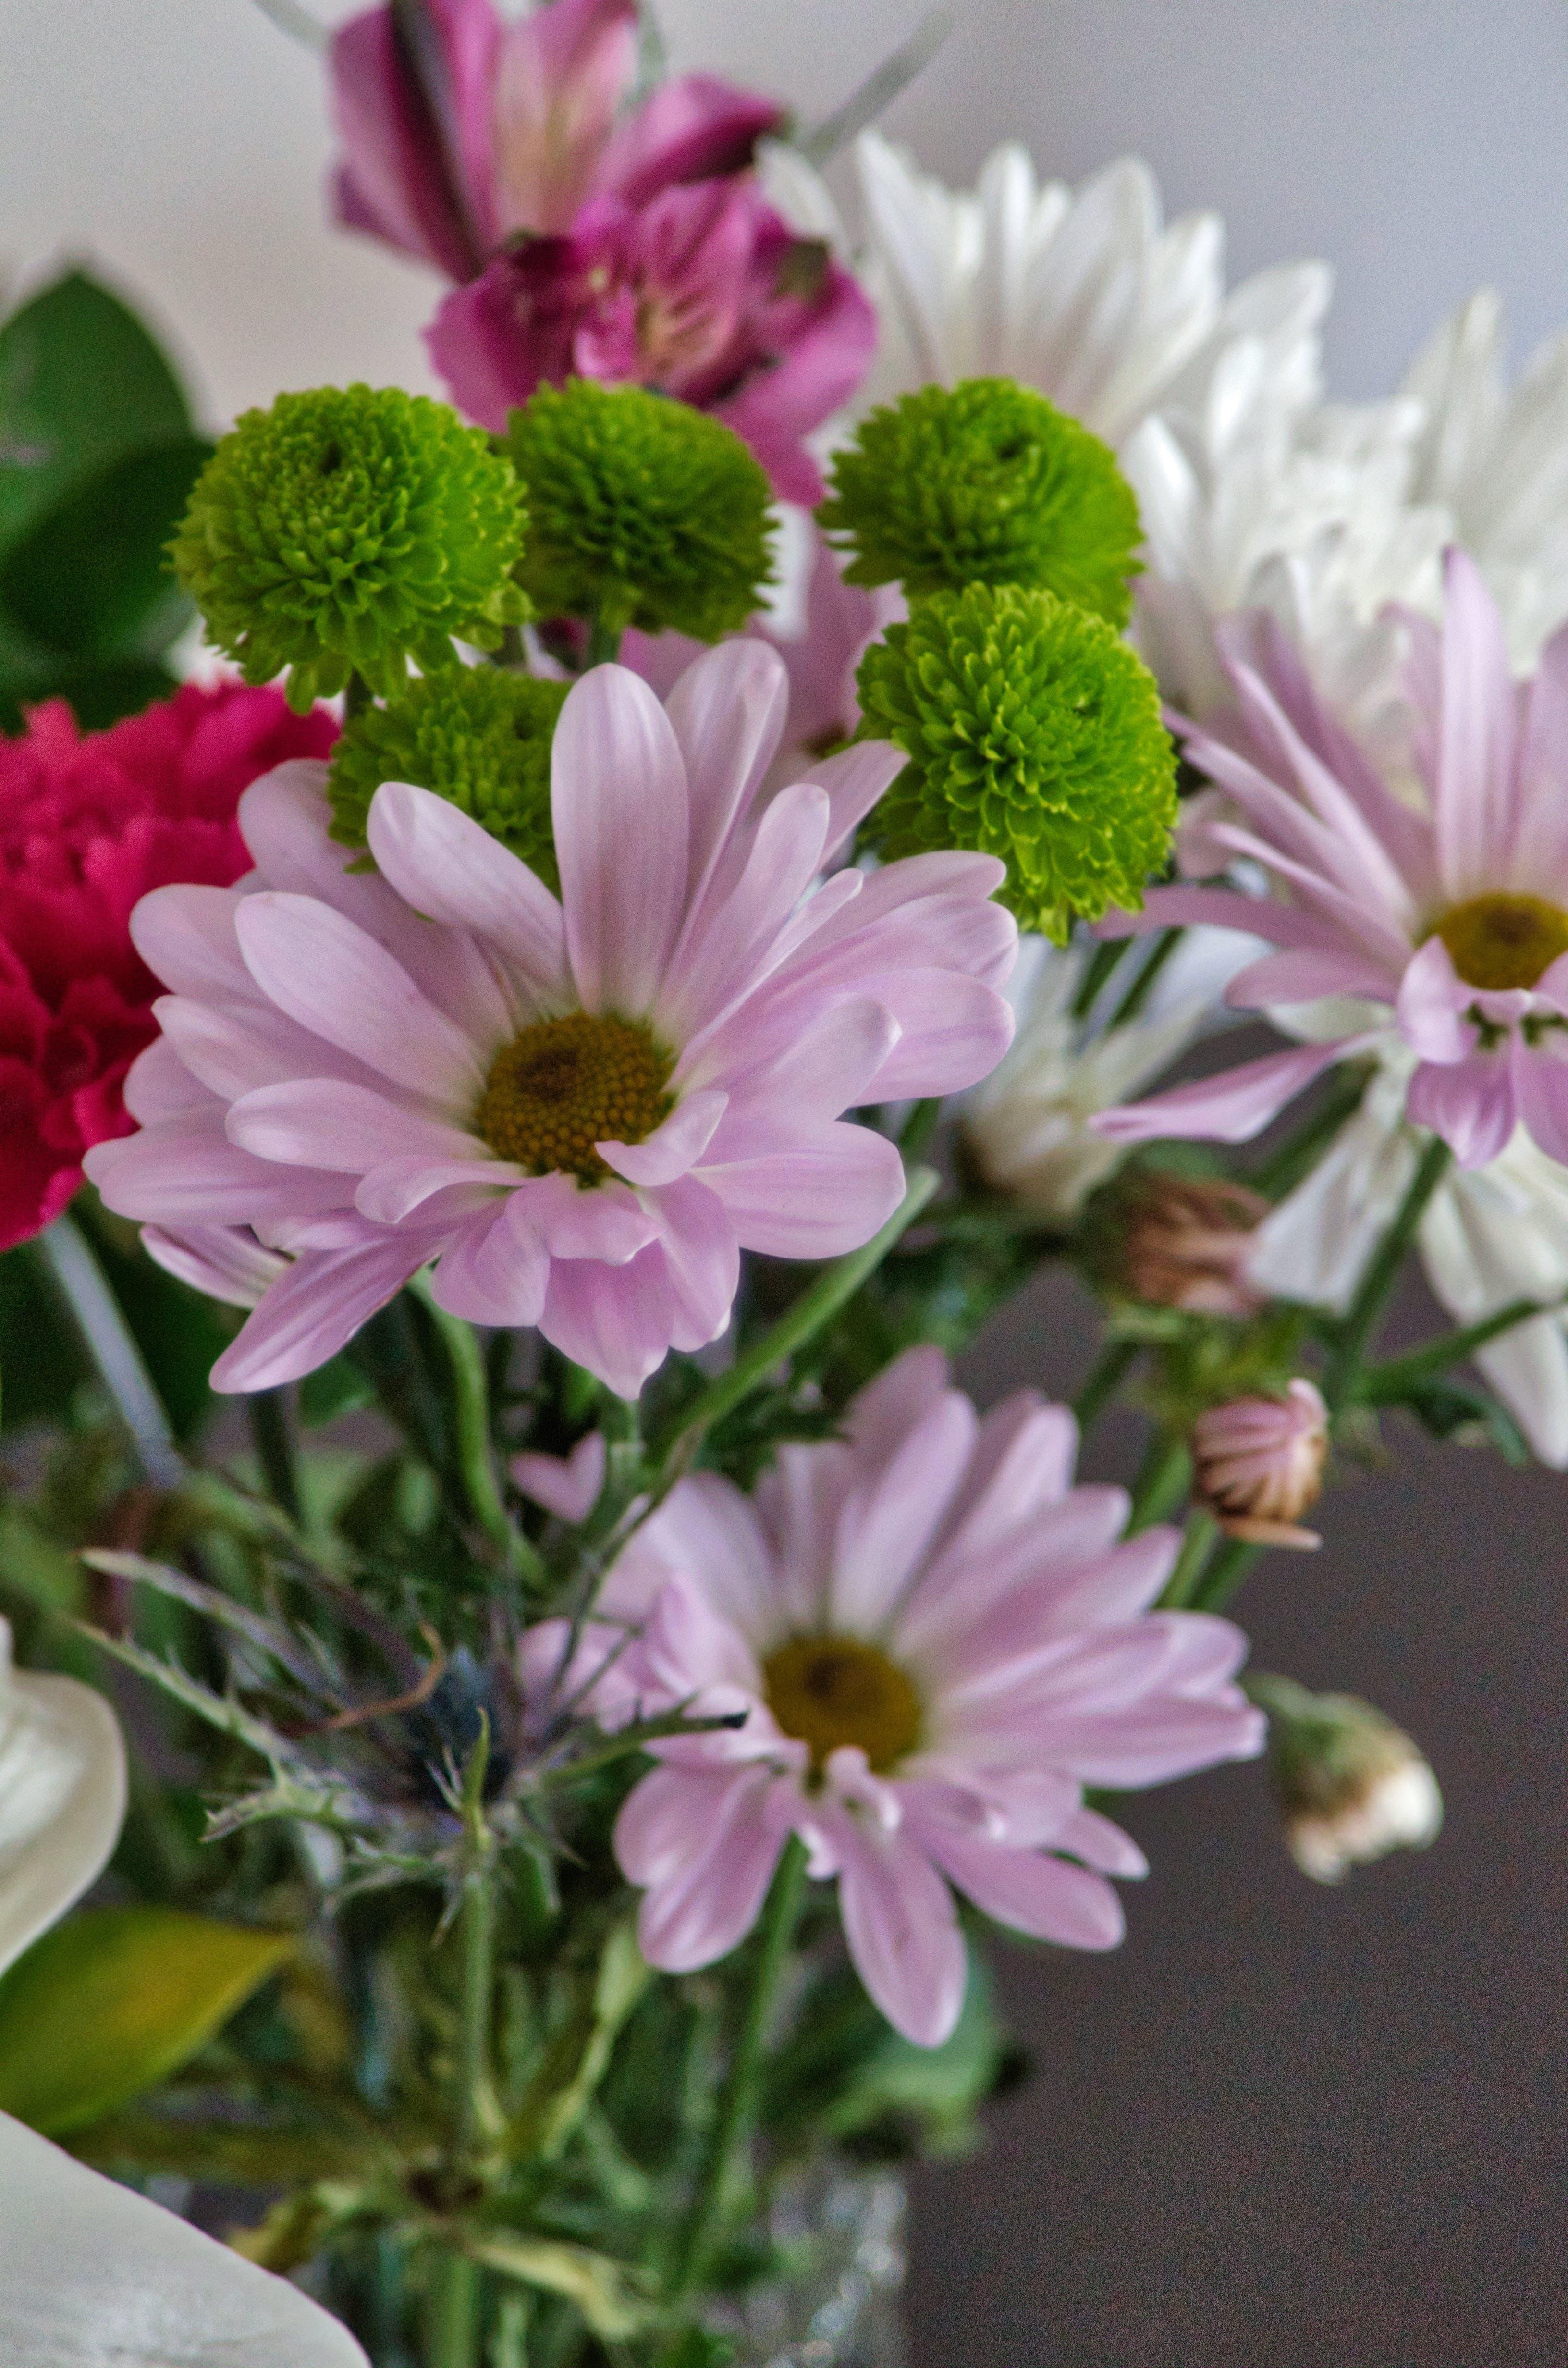 Free stock photo of garden wonders